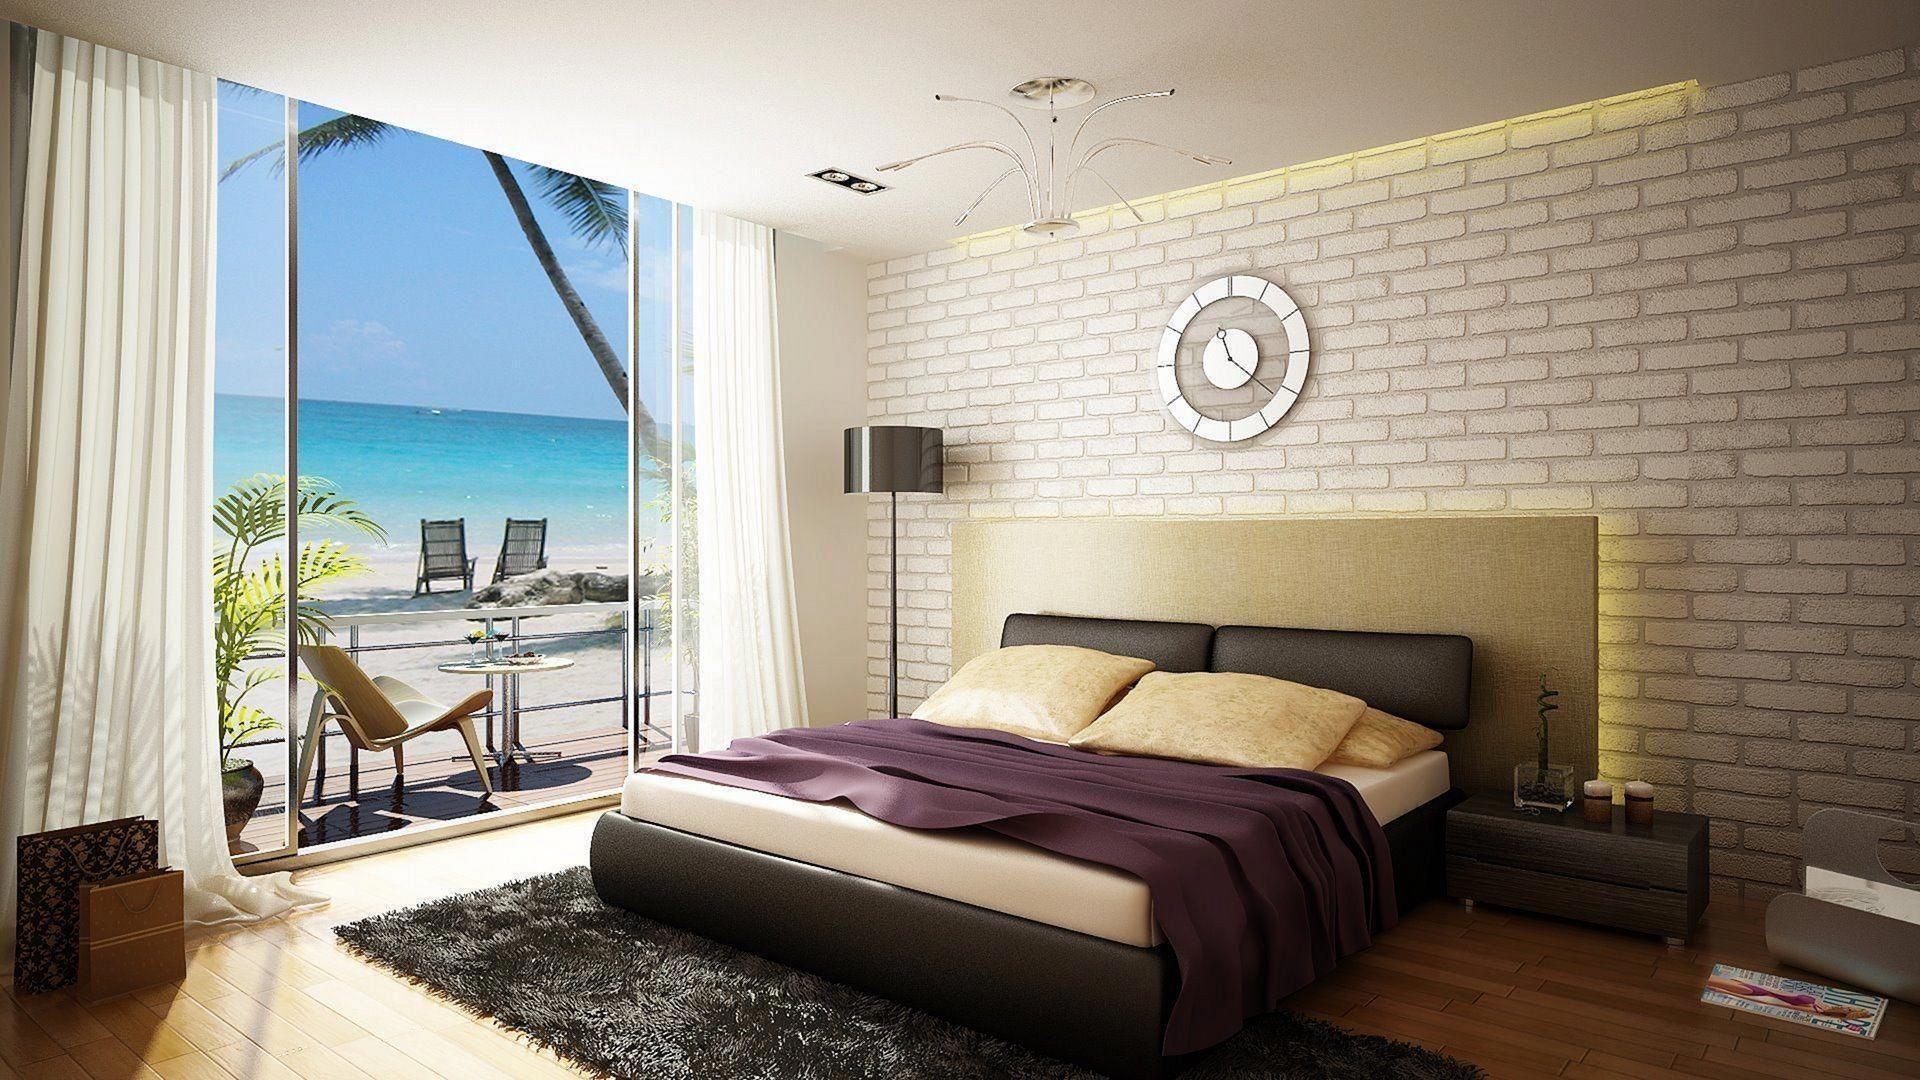 Pin by Design iHomes on Interior Design Decor Beach